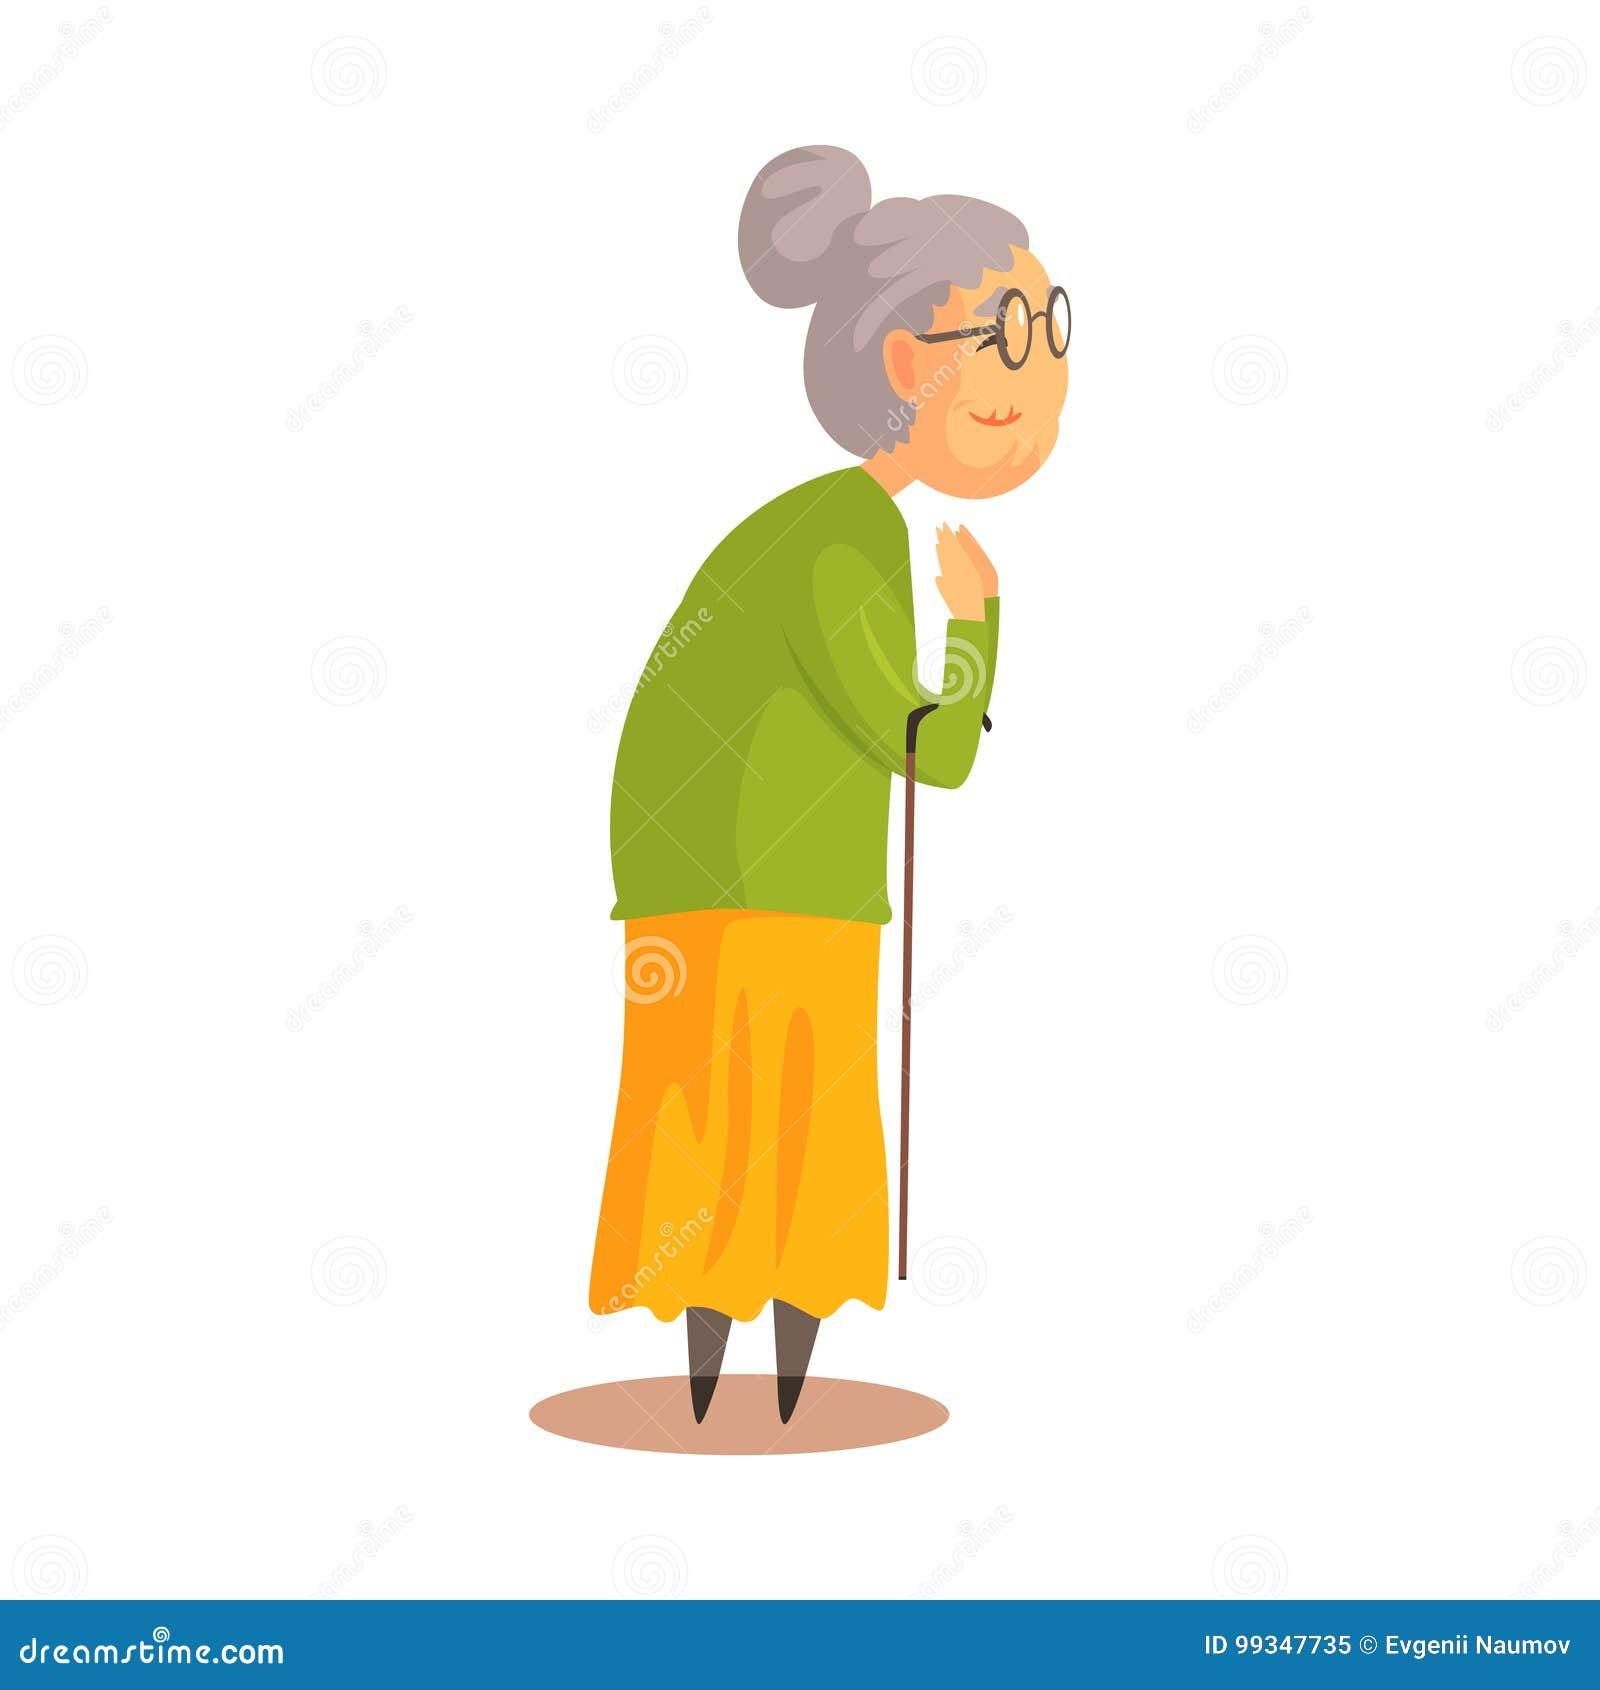 Funny Cartoon Old Grandma Granny Illustration Stock